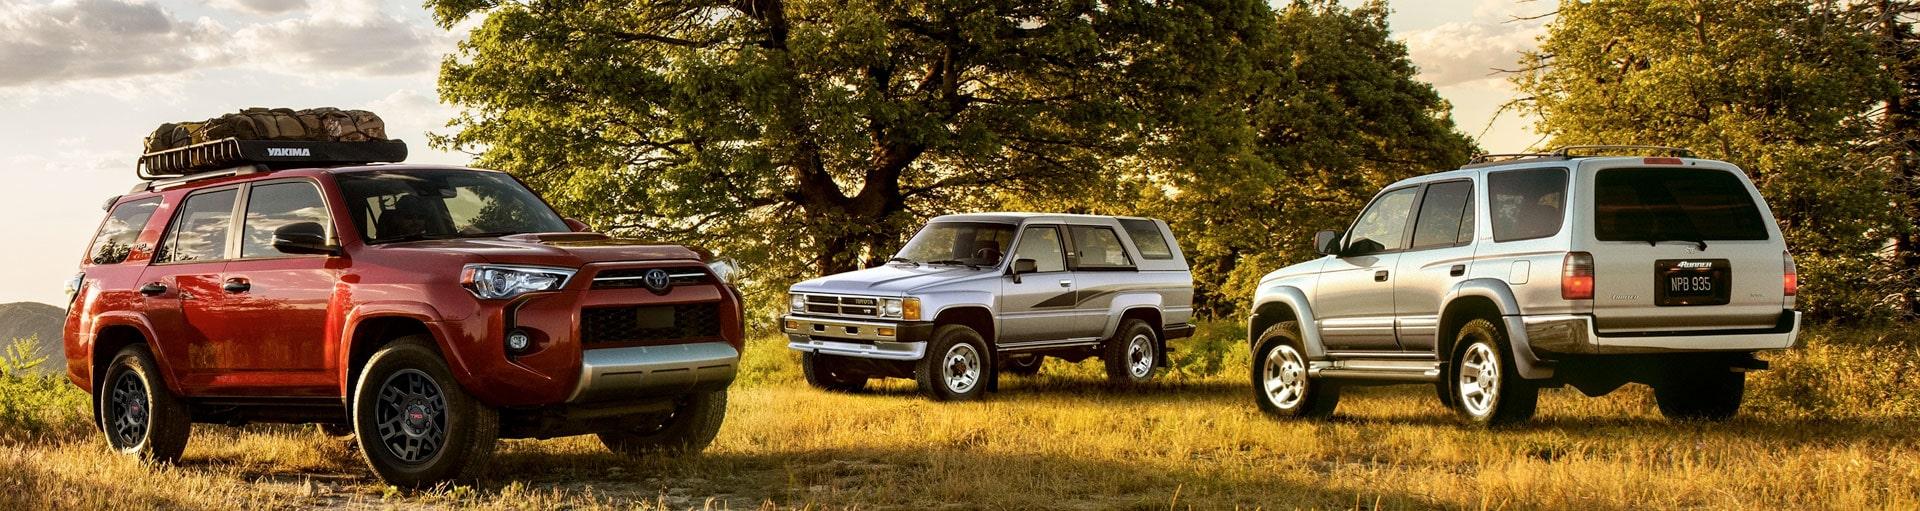 James Hodge Toyota Accessories Department